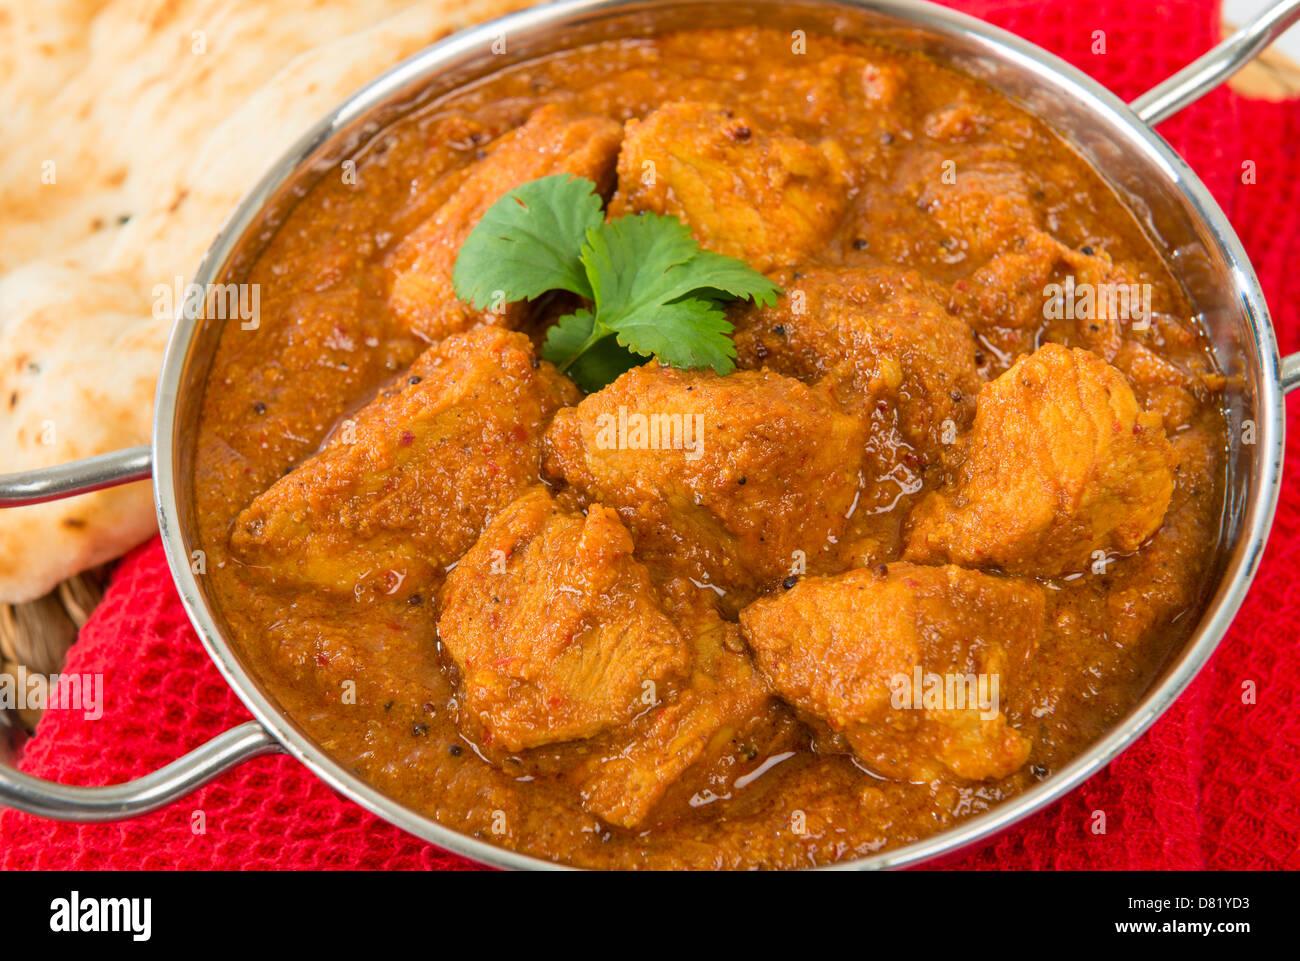 Goan Pork Vindaloo Indian Pork Curry With Naan Bread